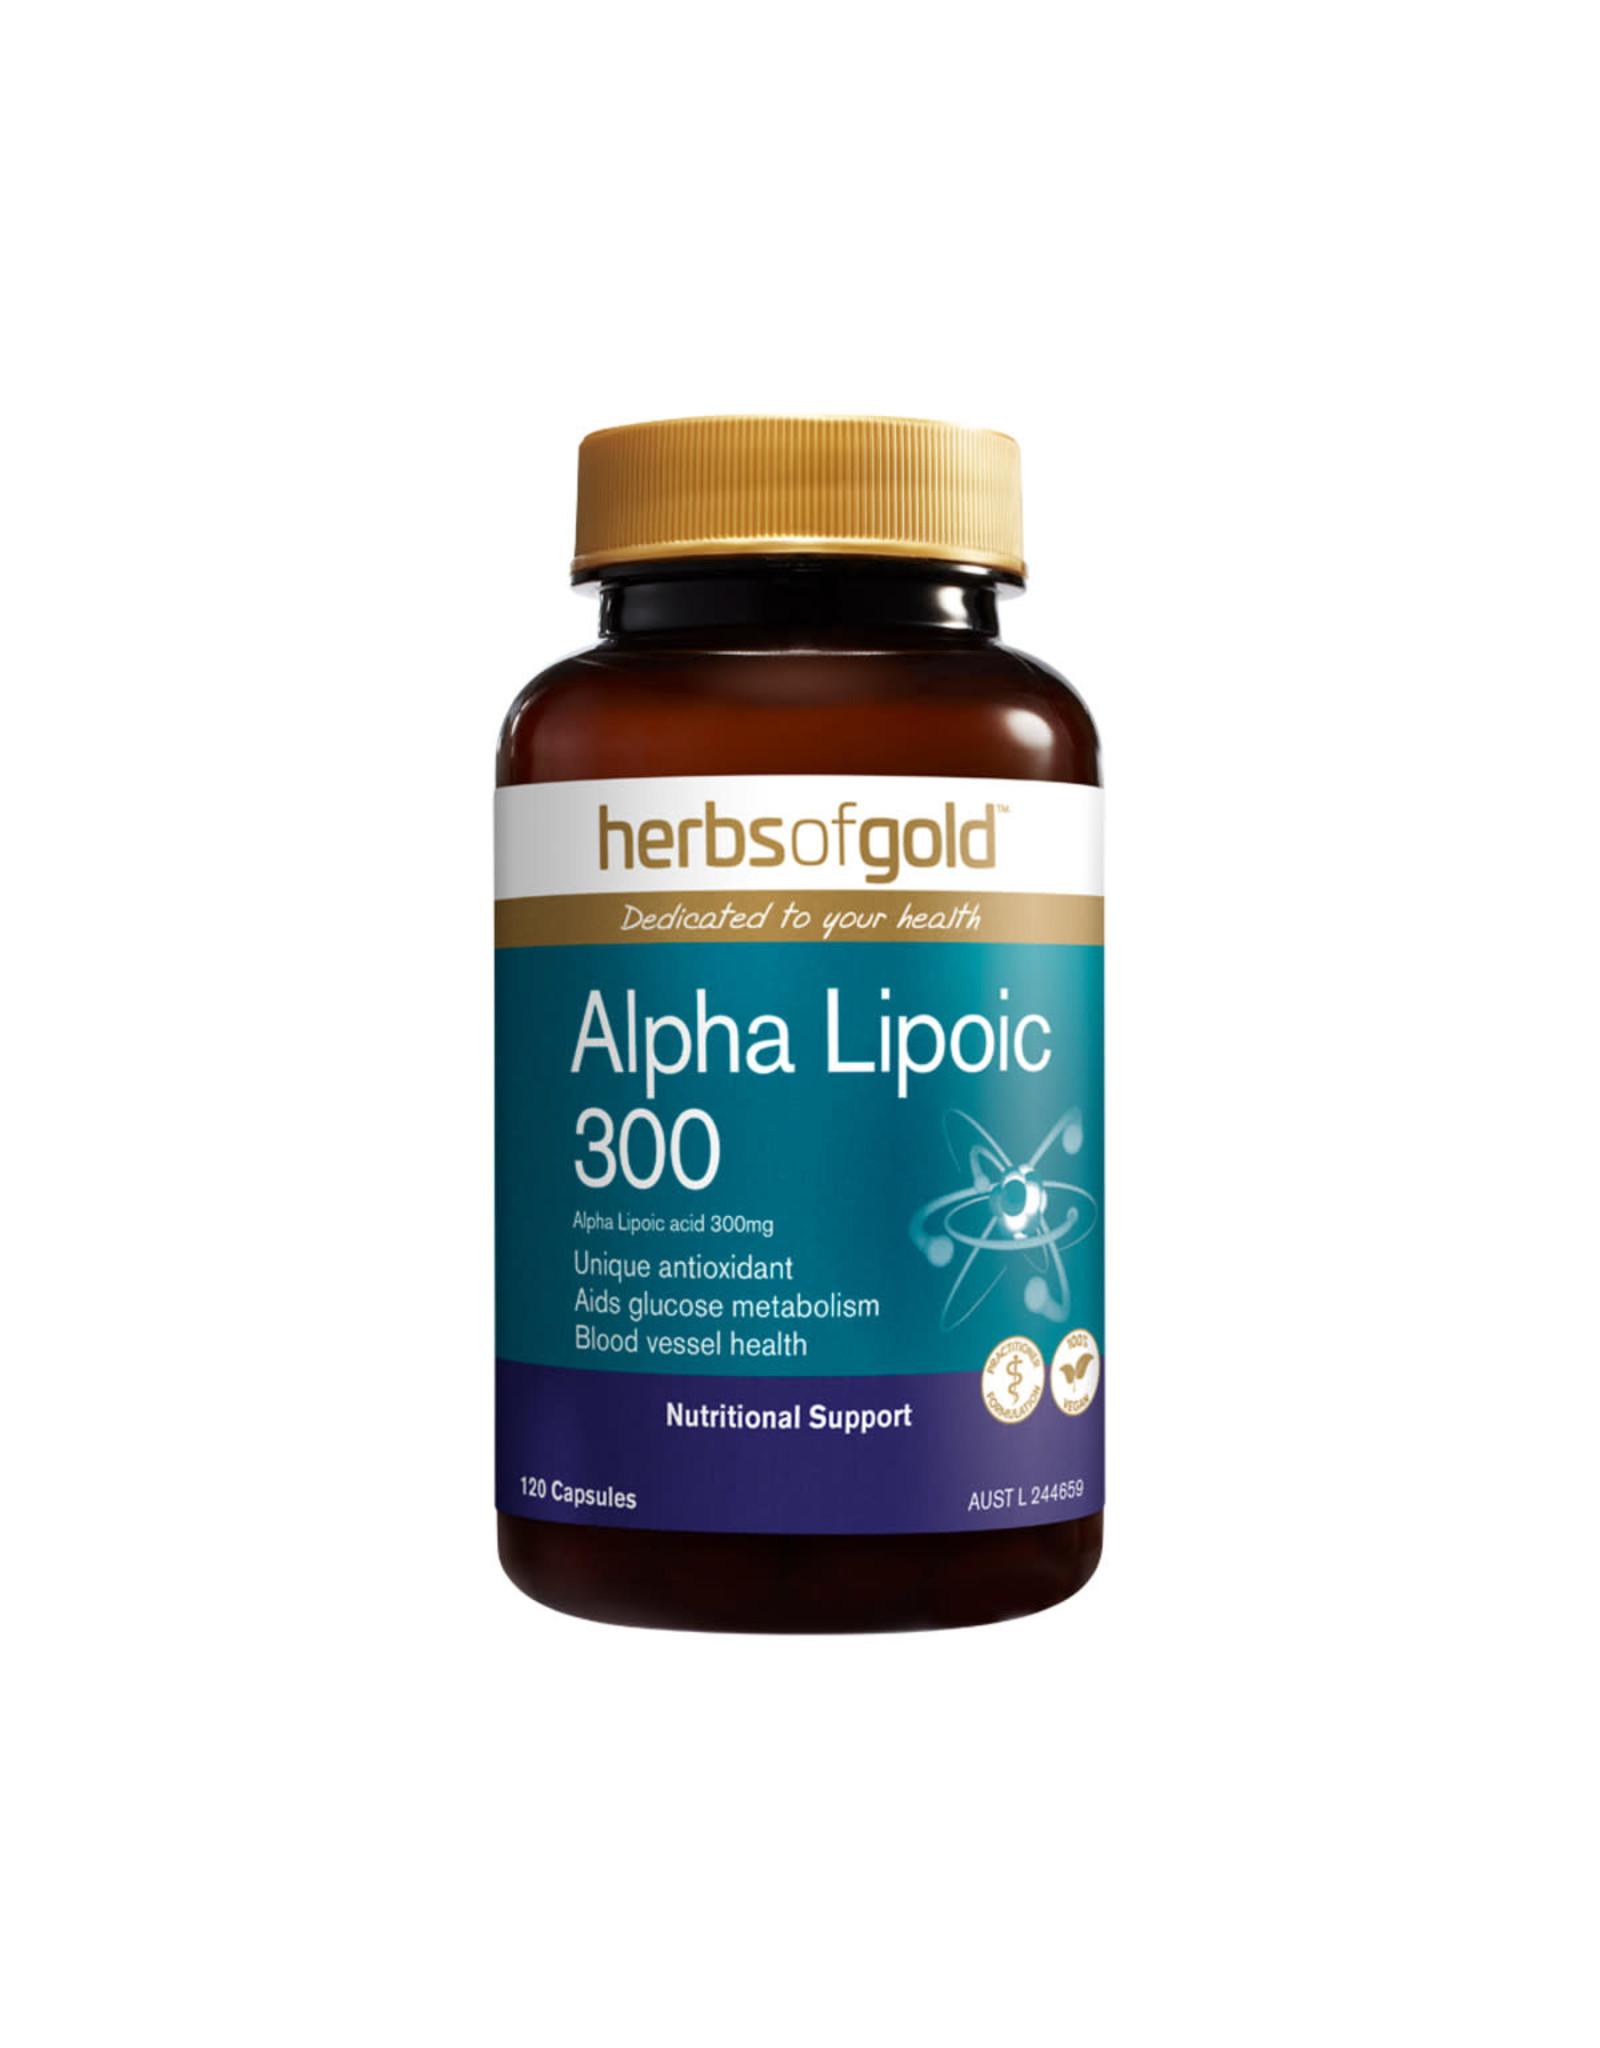 Herbs of Gold Alpha Lipoic 300